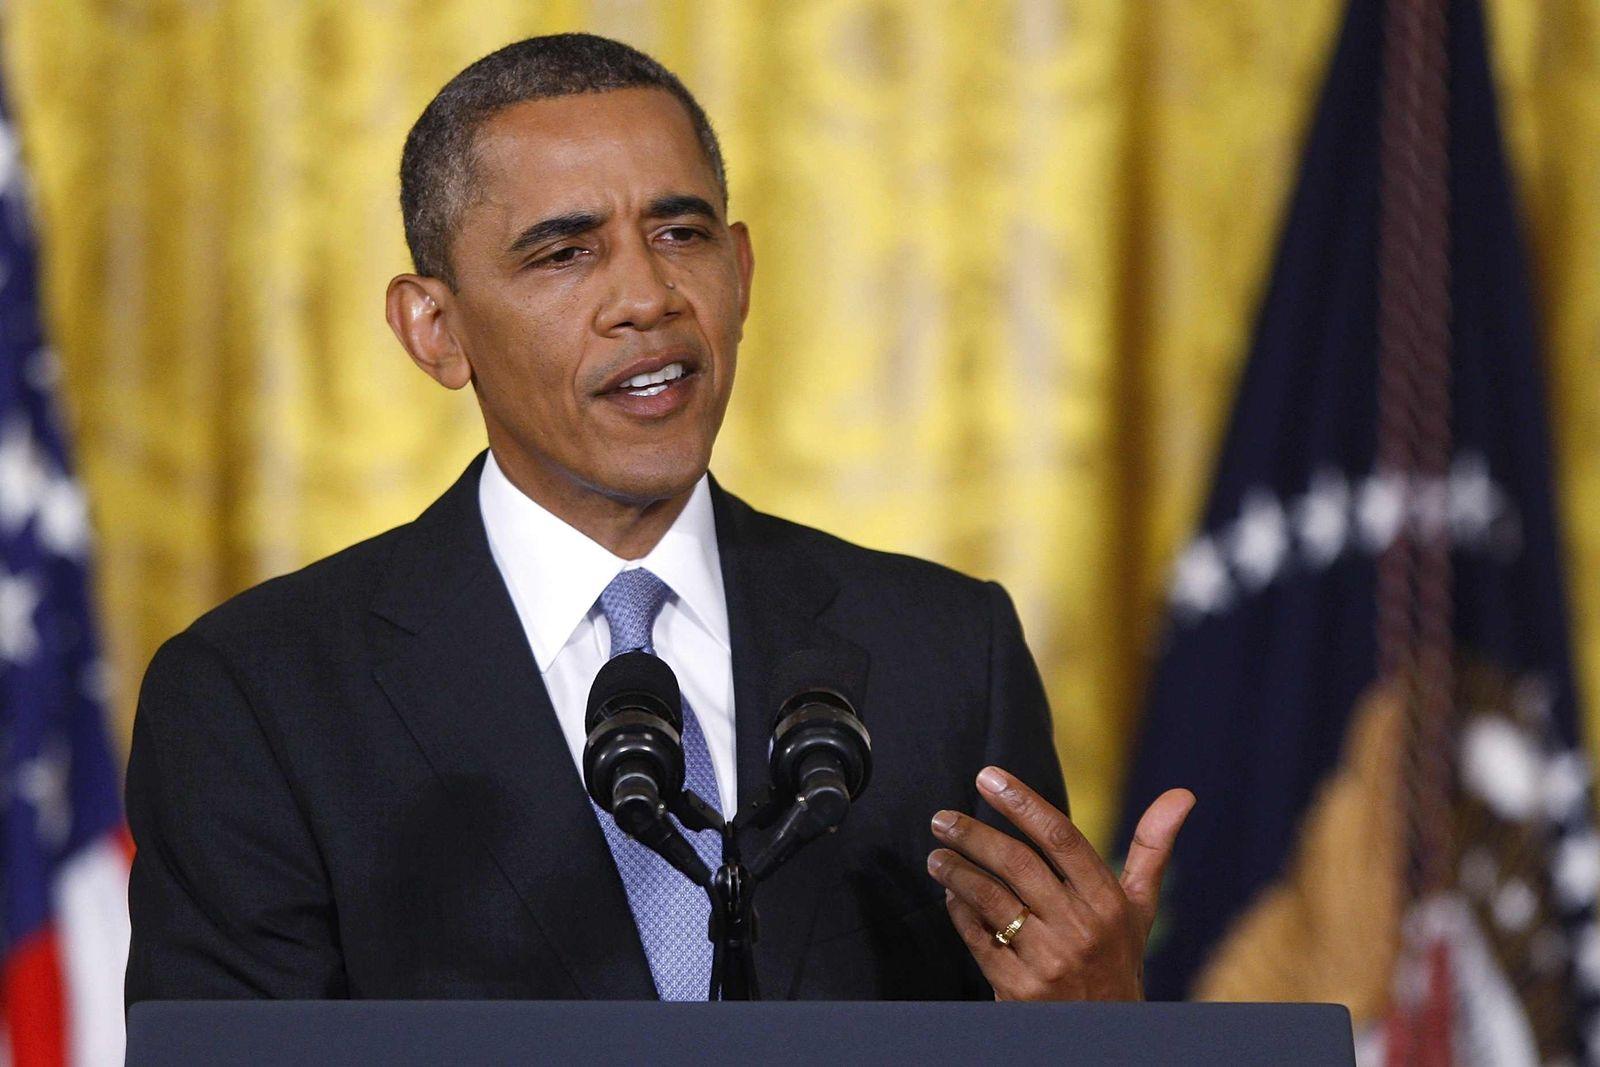 USA-OBAMA/SURVEILLANCE Pressekonferenez